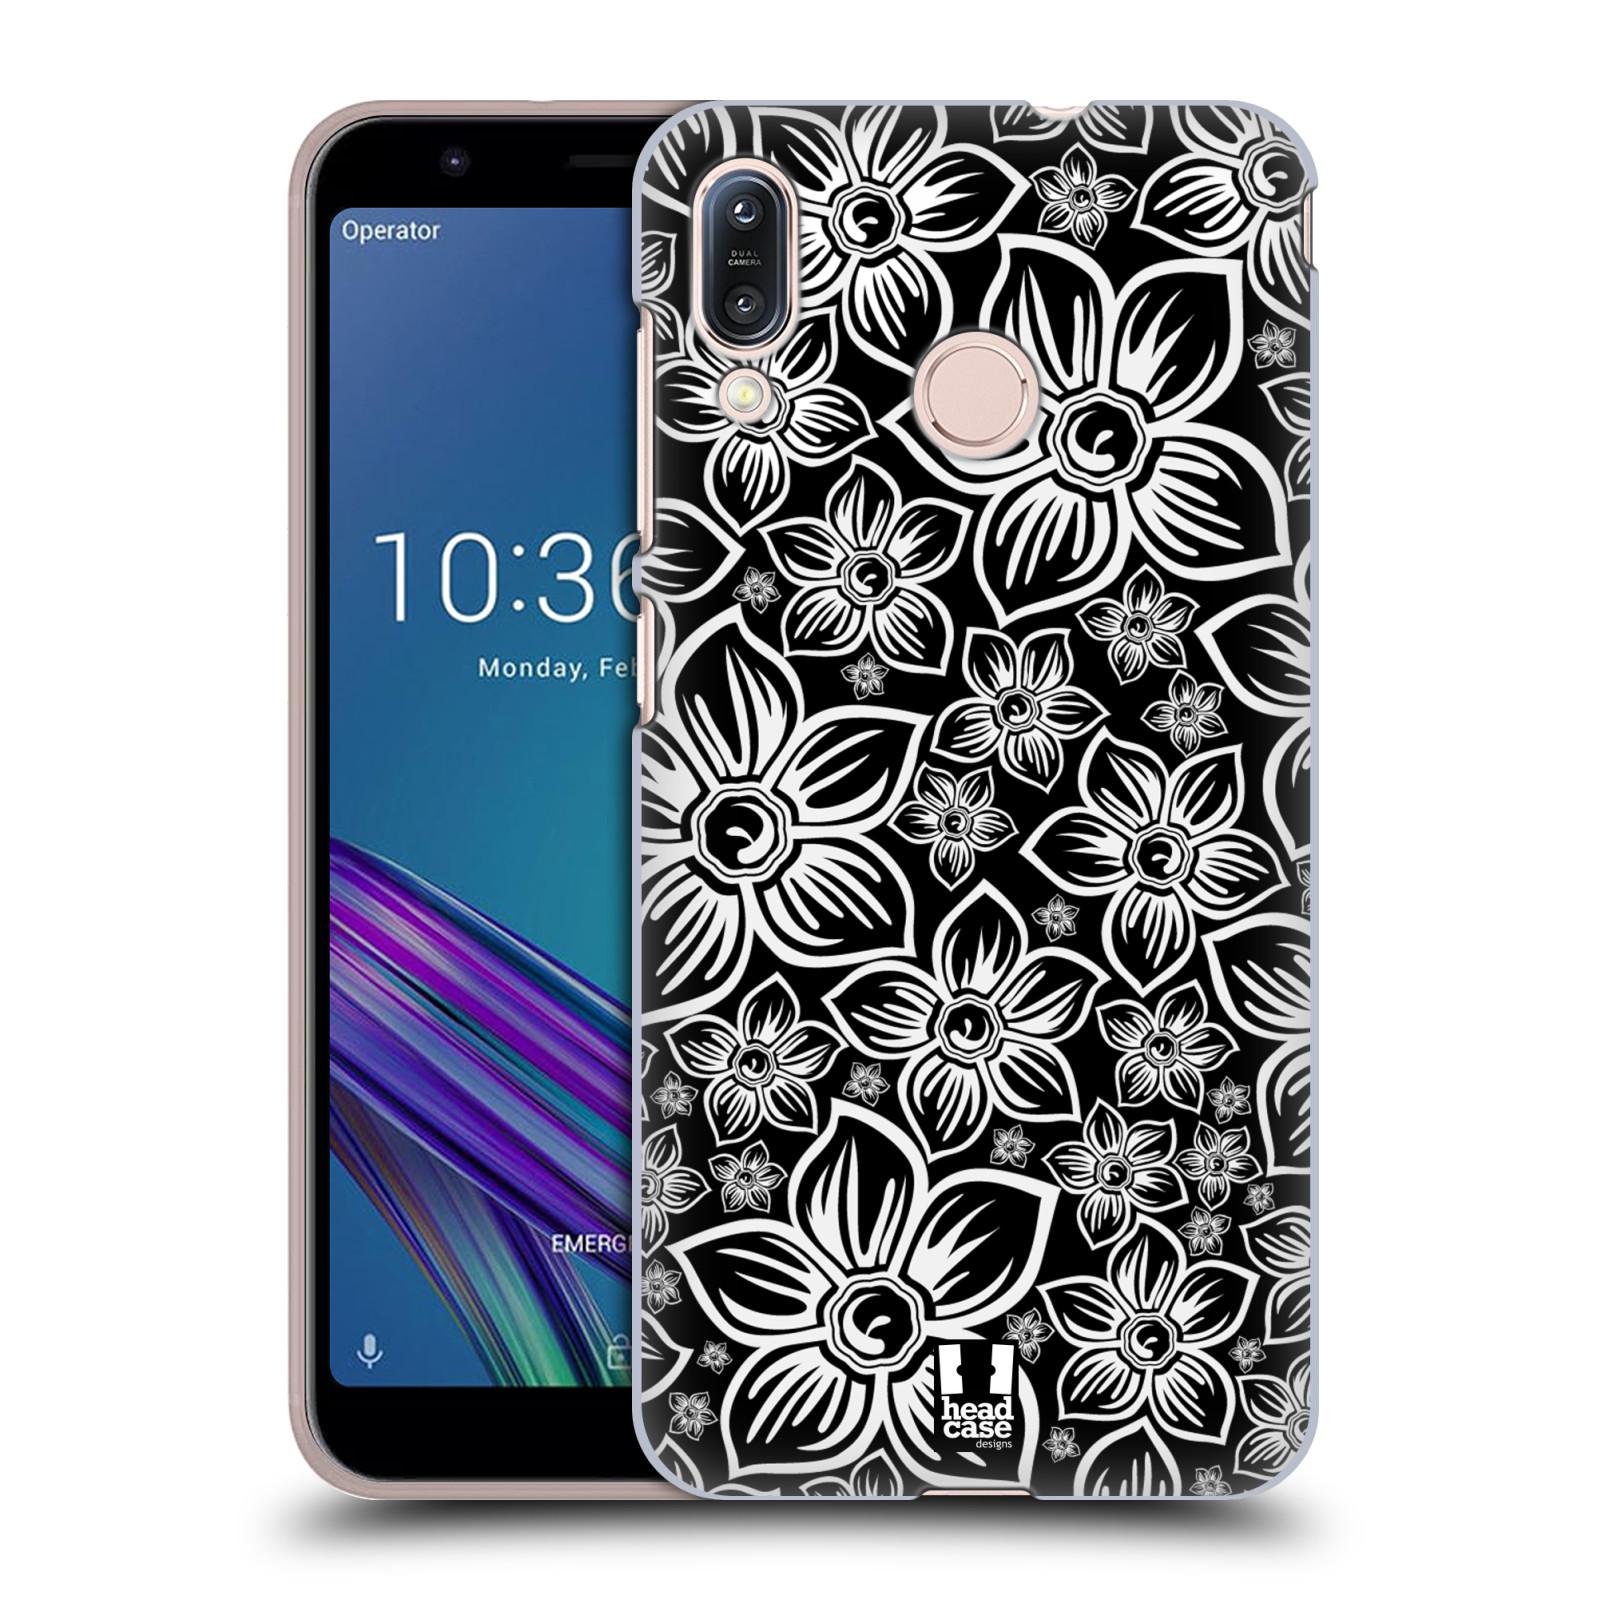 Plastové pouzdro na mobil Asus Zenfone Max M1 ZB555KL - Head Case - FLORAL DAISY